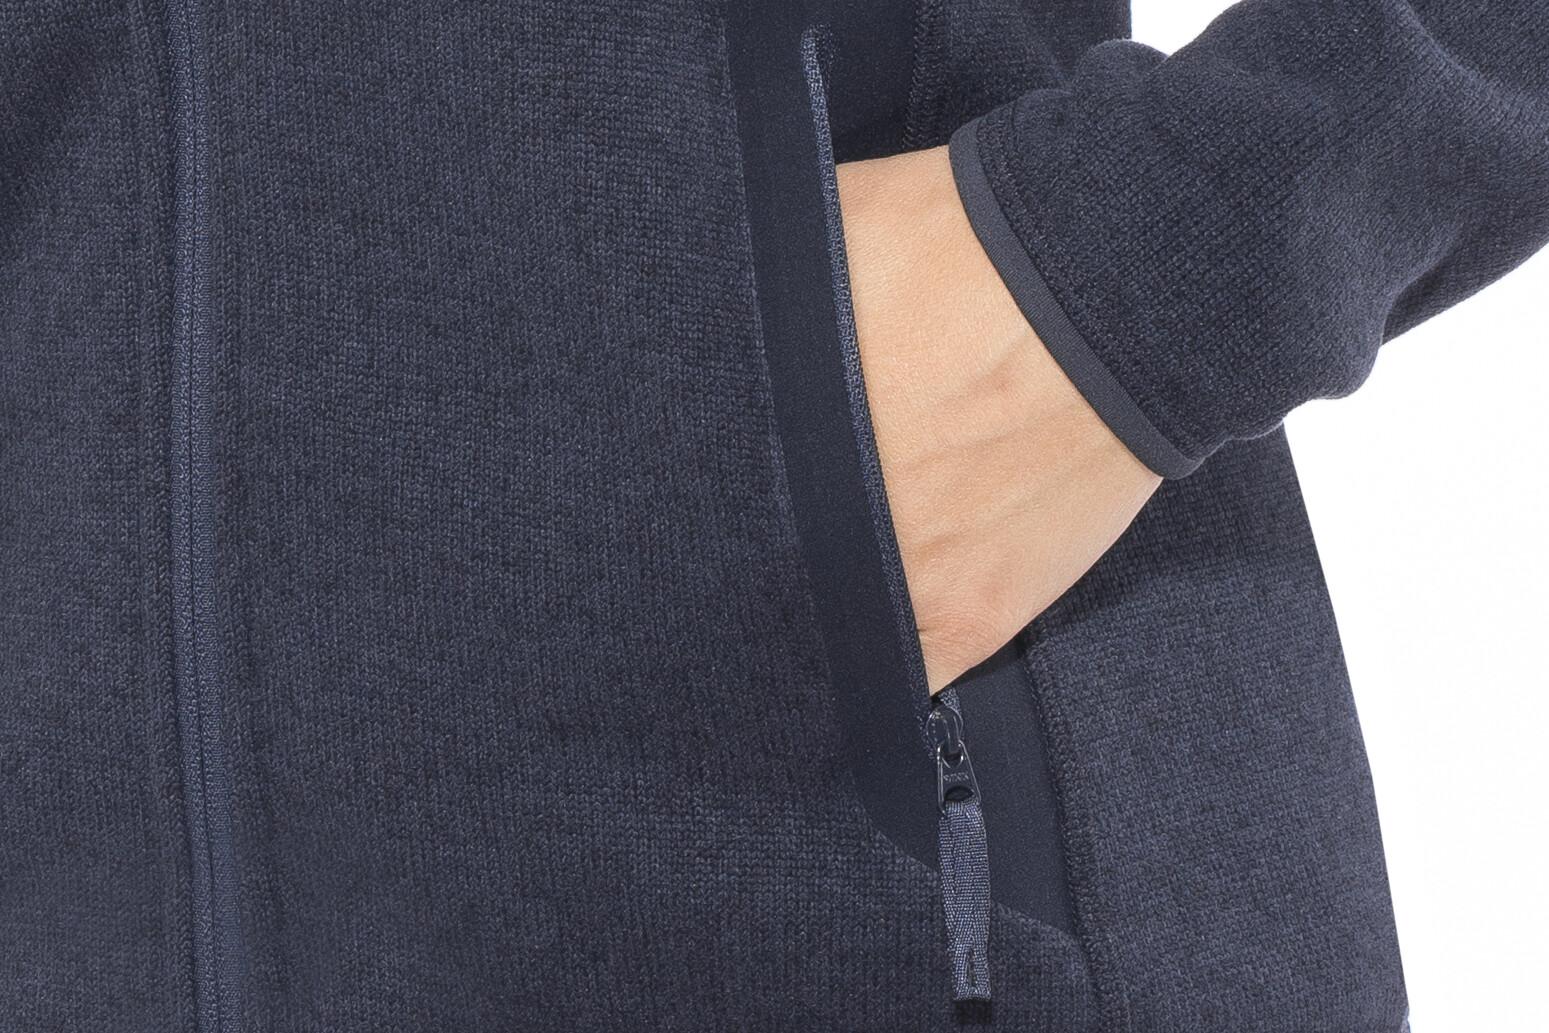 outlet for sale sale brand new Arc'teryx Covert Veste Femme, black sapphire